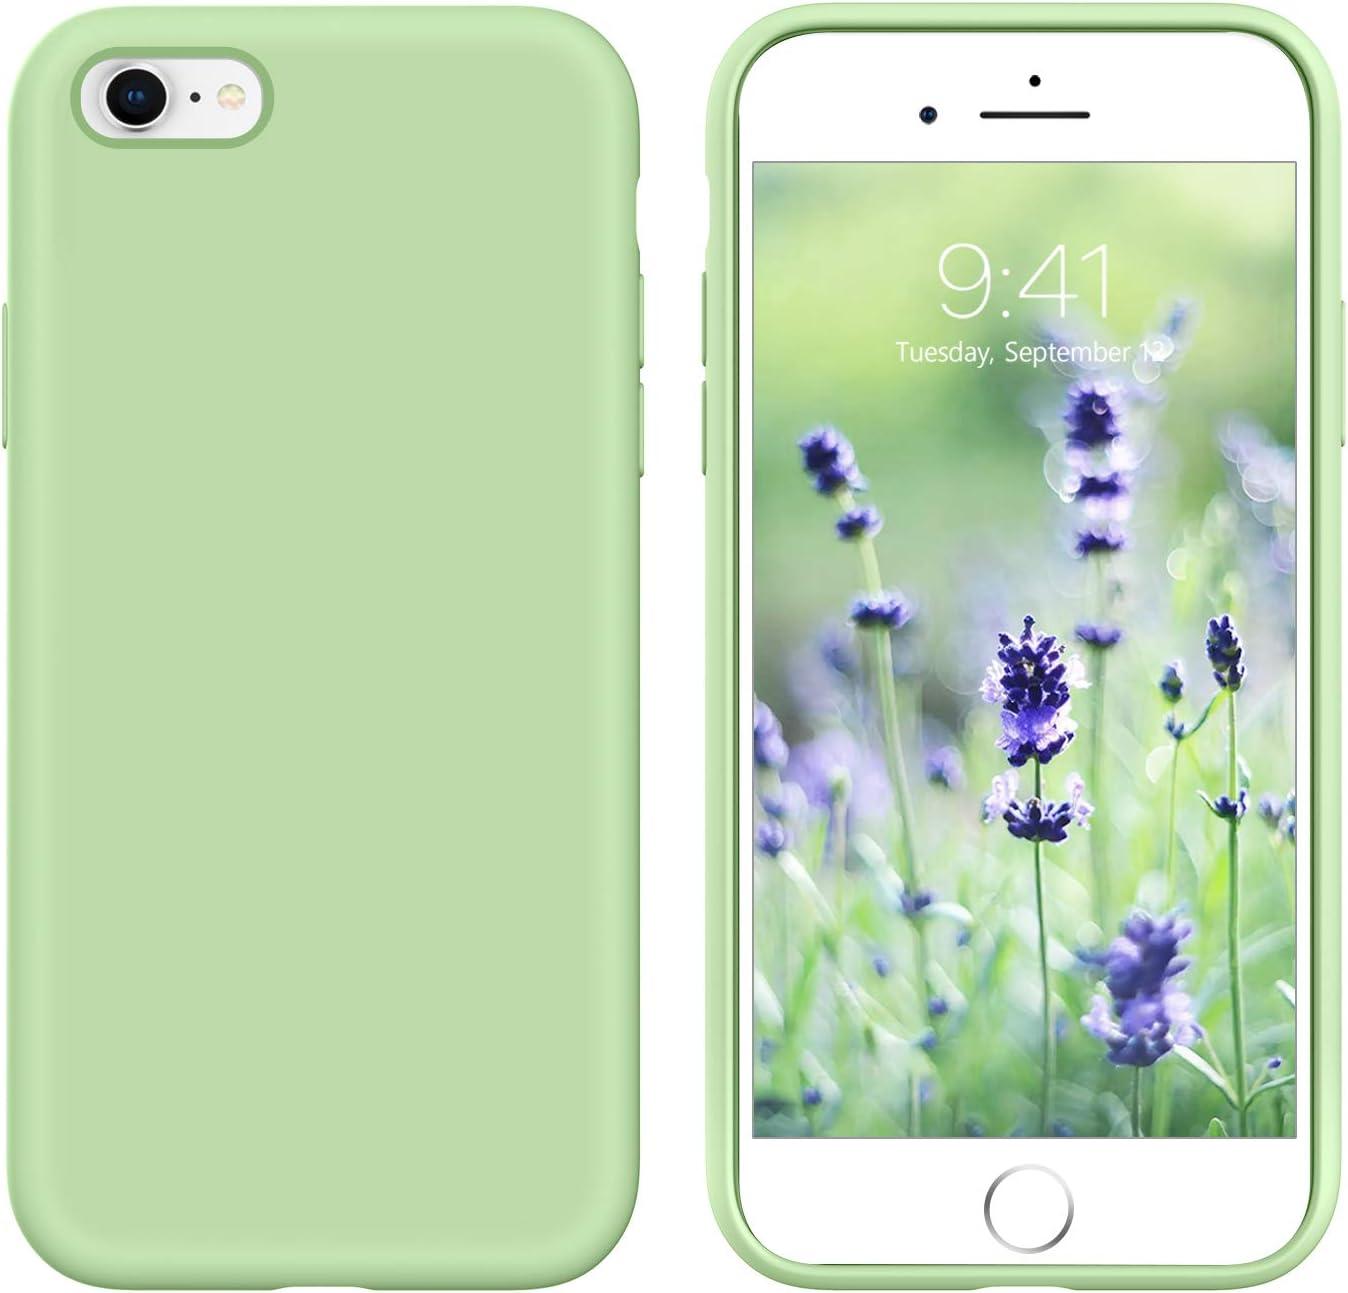 GUAGUA iPhone 6s Plus Case iPhone 6 Plus Case Liquid Silicone Soft Gel Rubber Slim Lightweight Microfiber Lining Cushion Texture Shockproof Protective Phone Case for iPhone 6 Plus/6s Plus Matcha Green